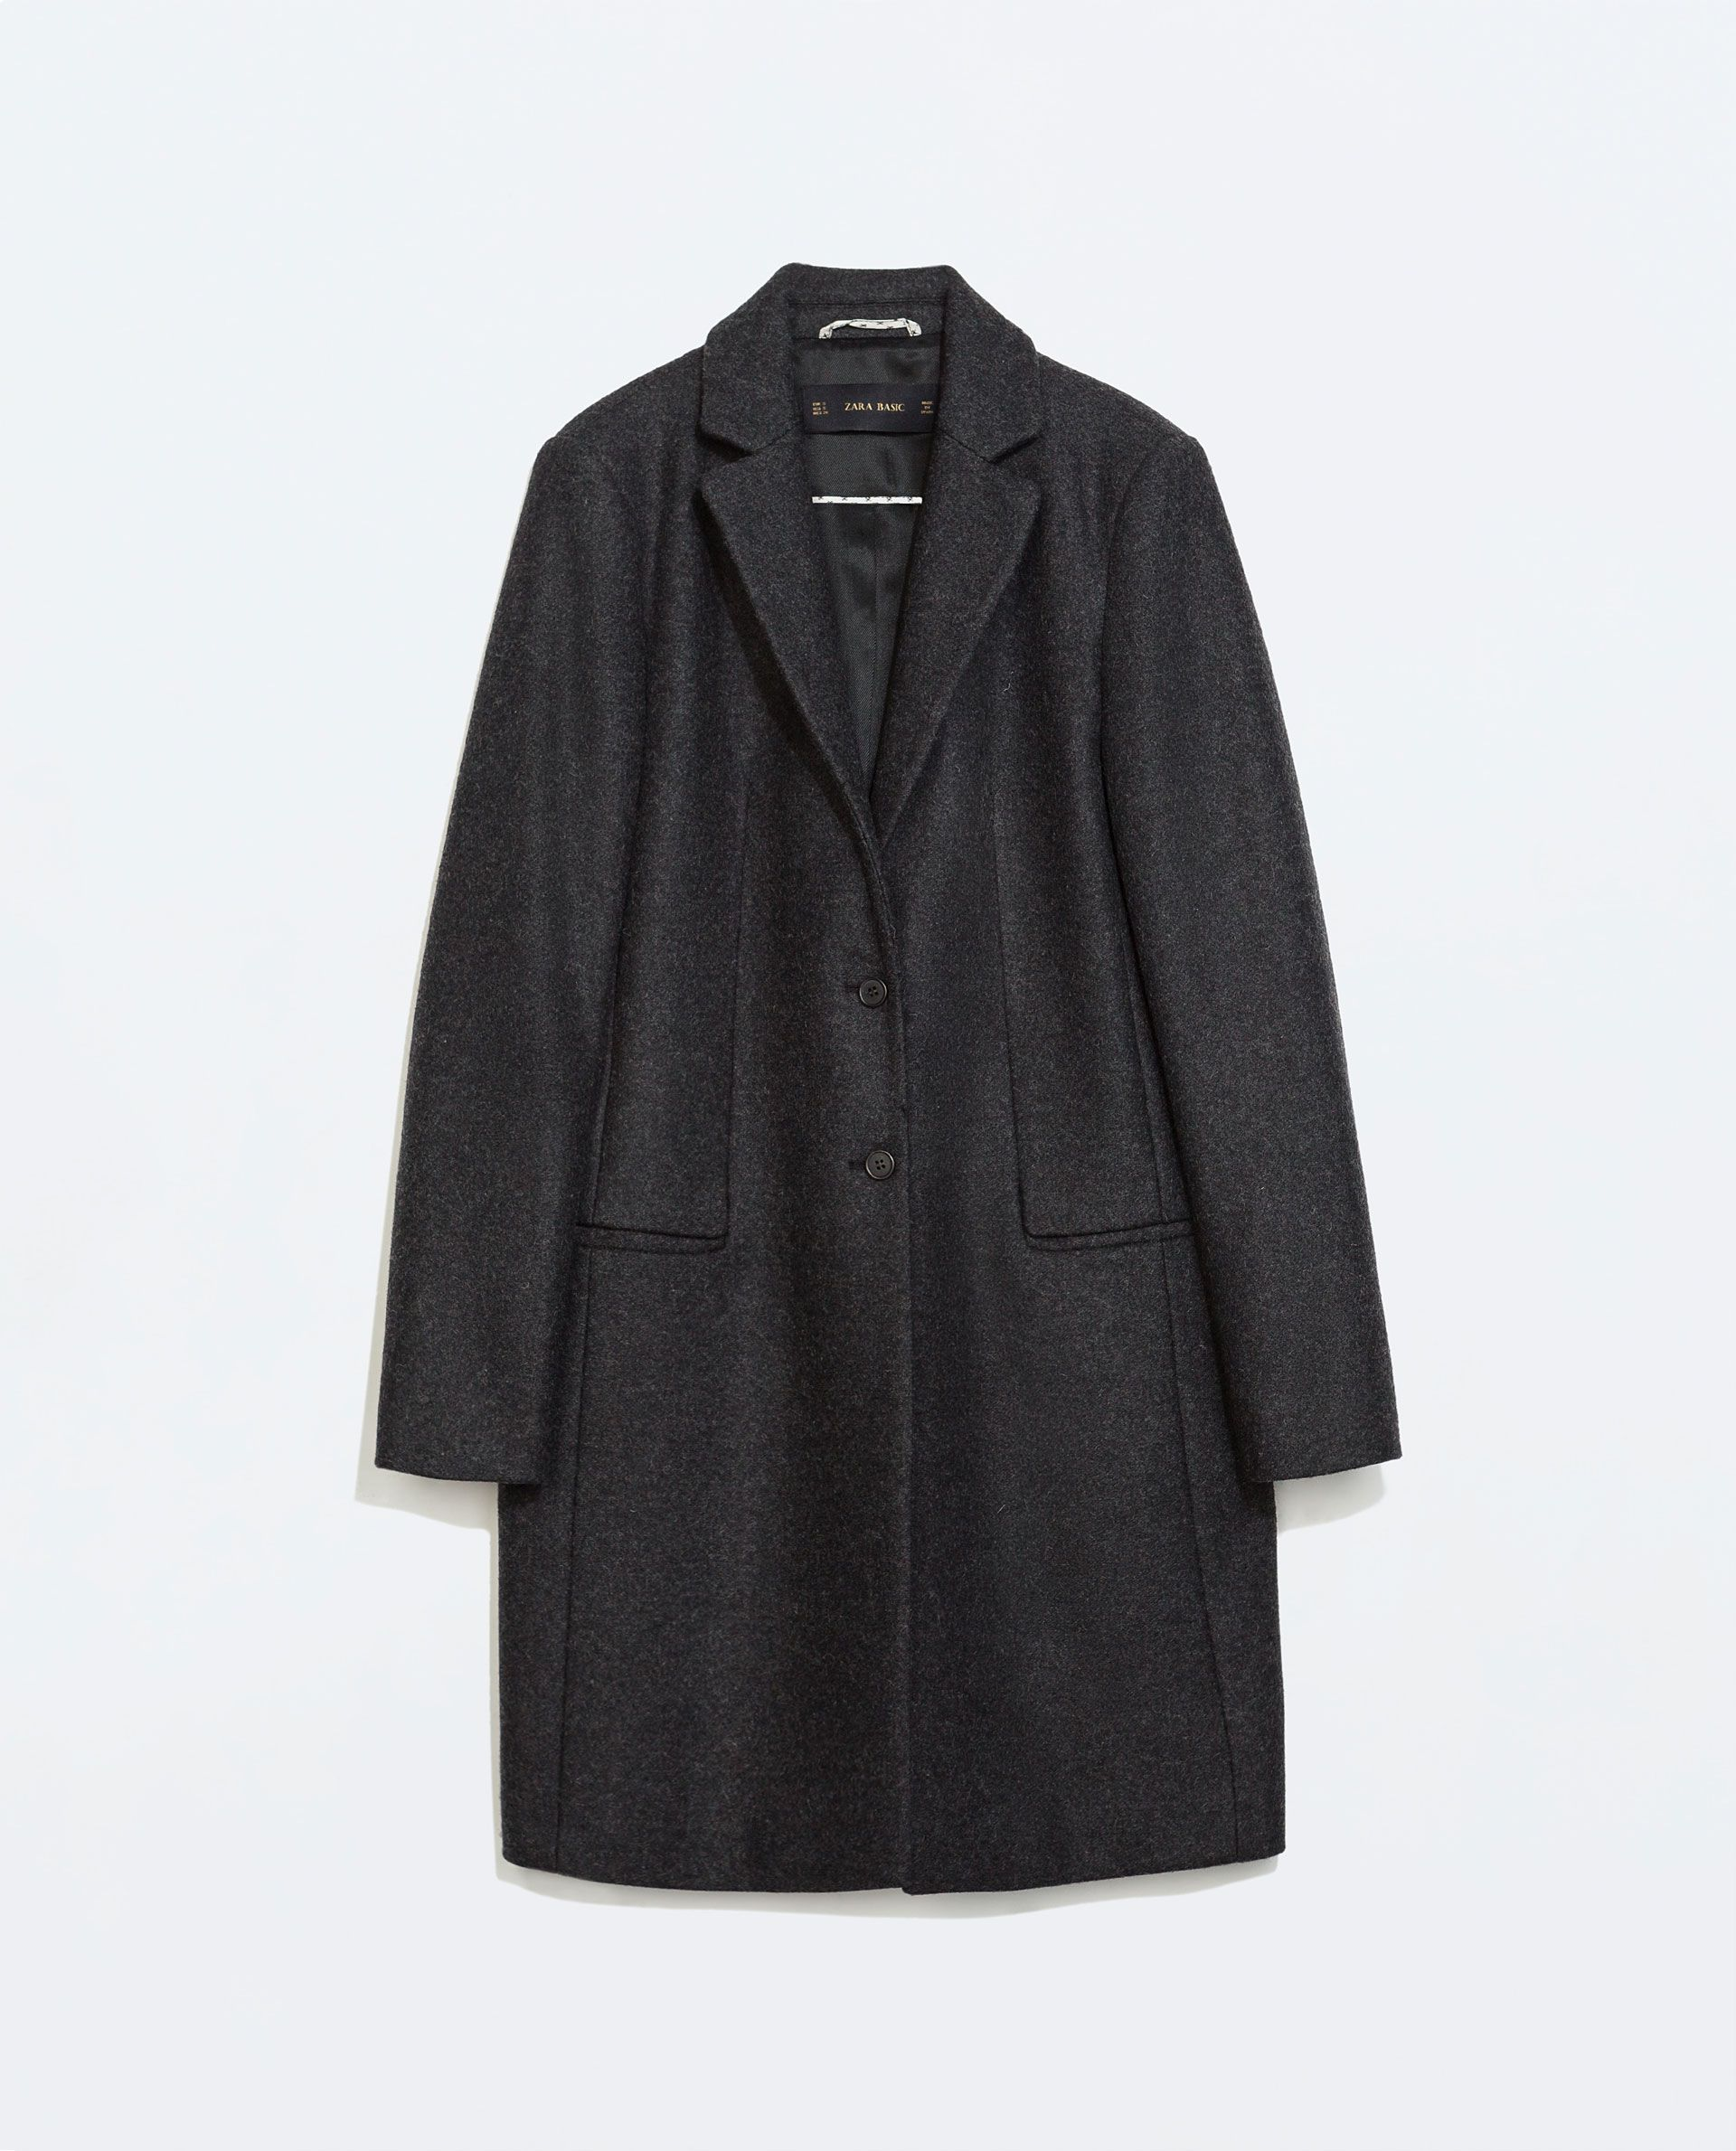 ZARA   Wool coat with lapels in dark grey   80% wool, 15 ...